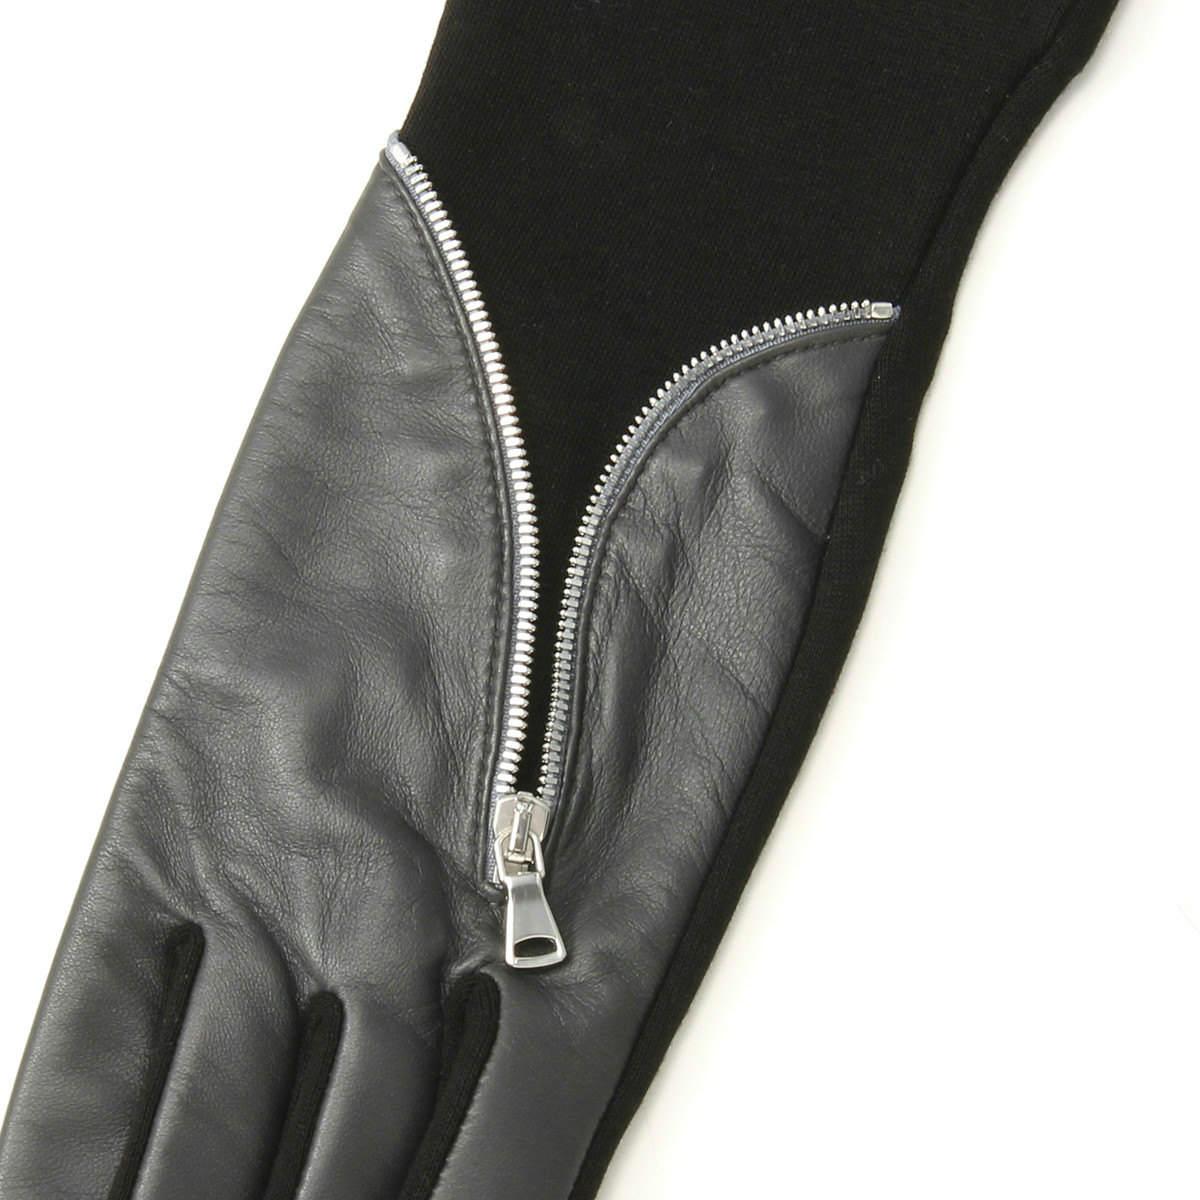 BIYUTE レディース ジャージ手袋 ちょっと長め丈 甲側レザー ジッパーがクール ストレッチ素材 Mサイズ 全2色